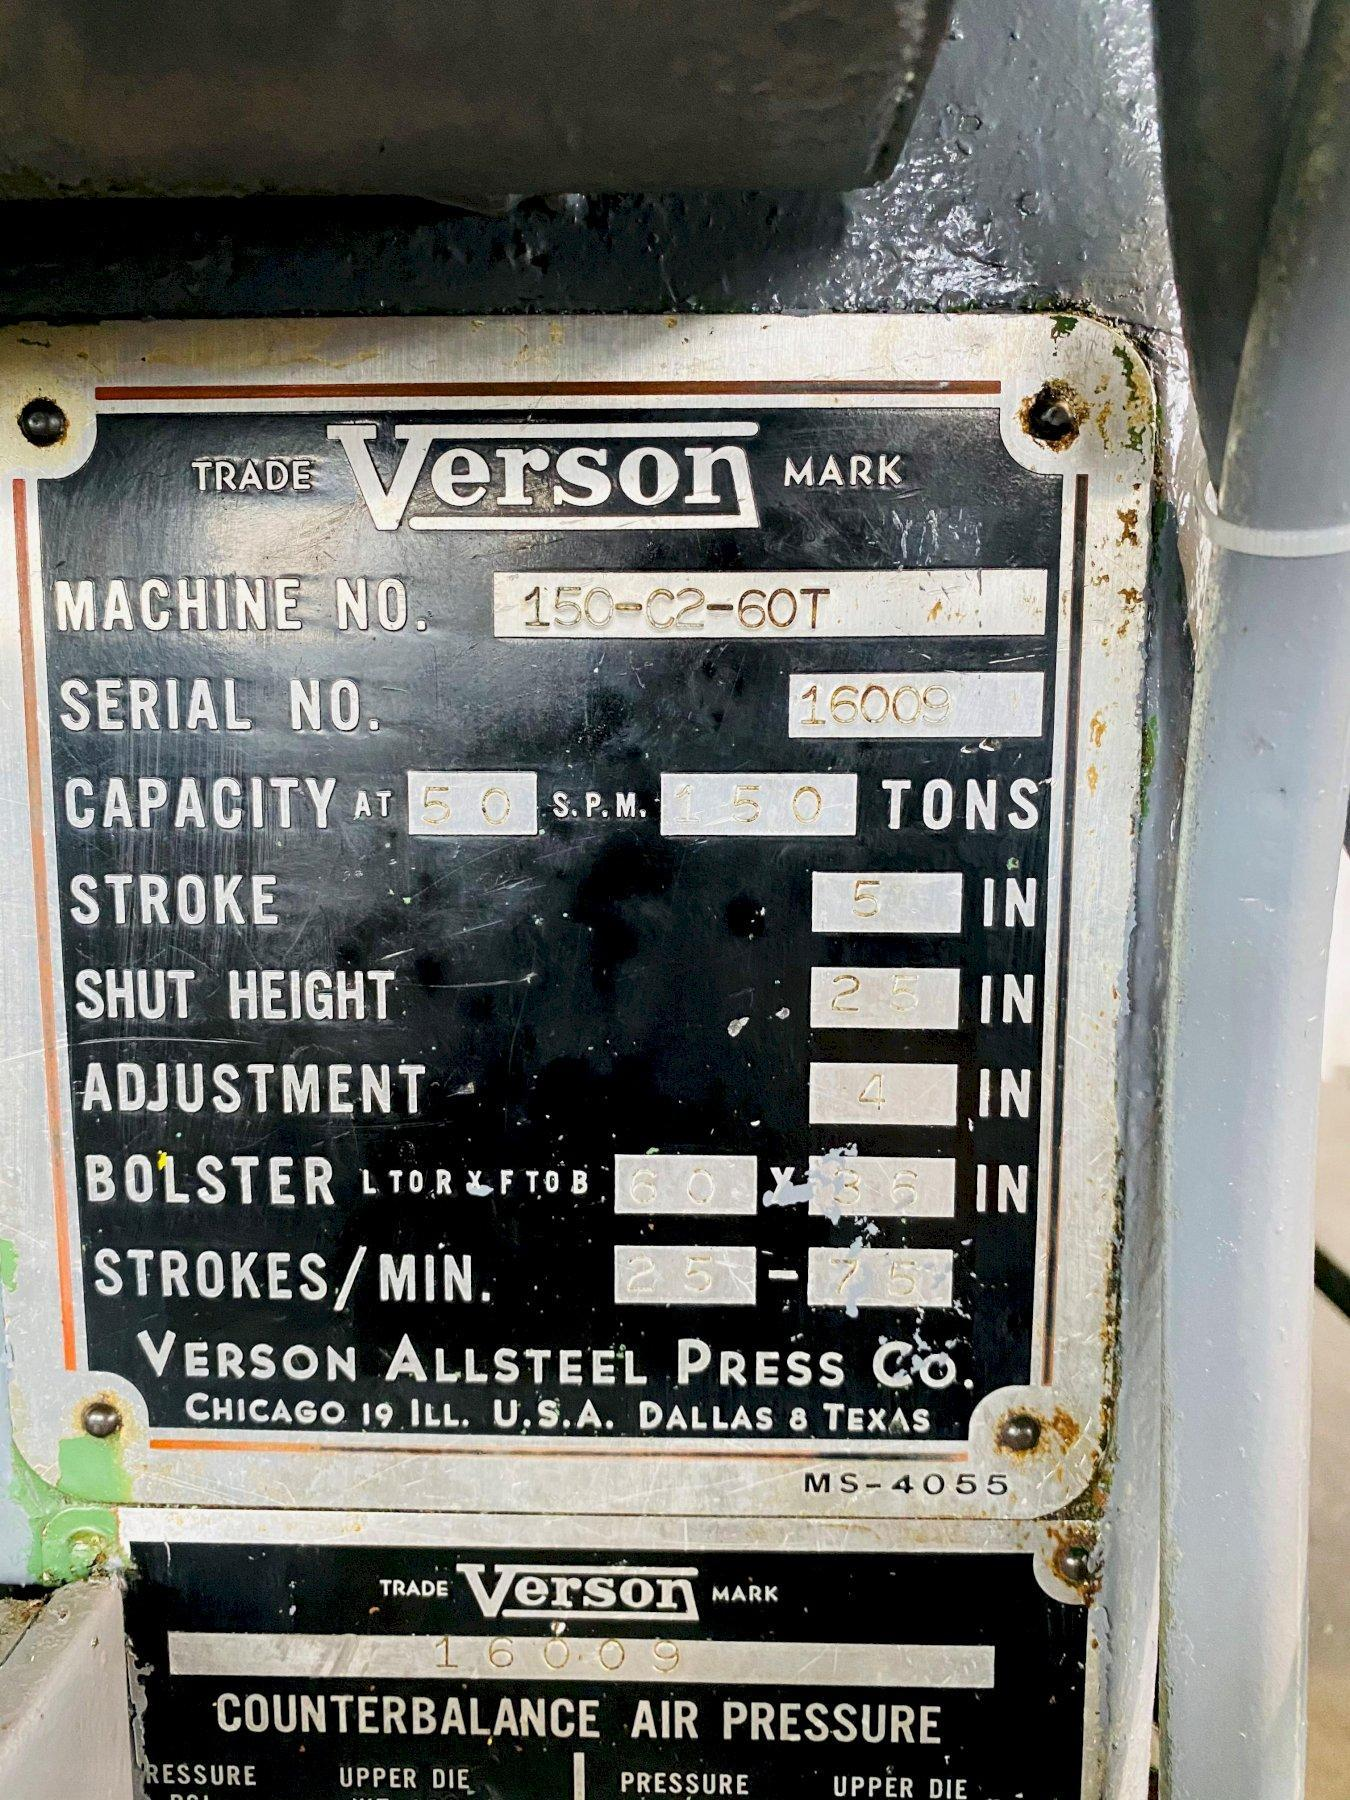 150 TON VERSON 150-C2-60T STRAIGHT SIDE PRESS. STOCK # 0507220